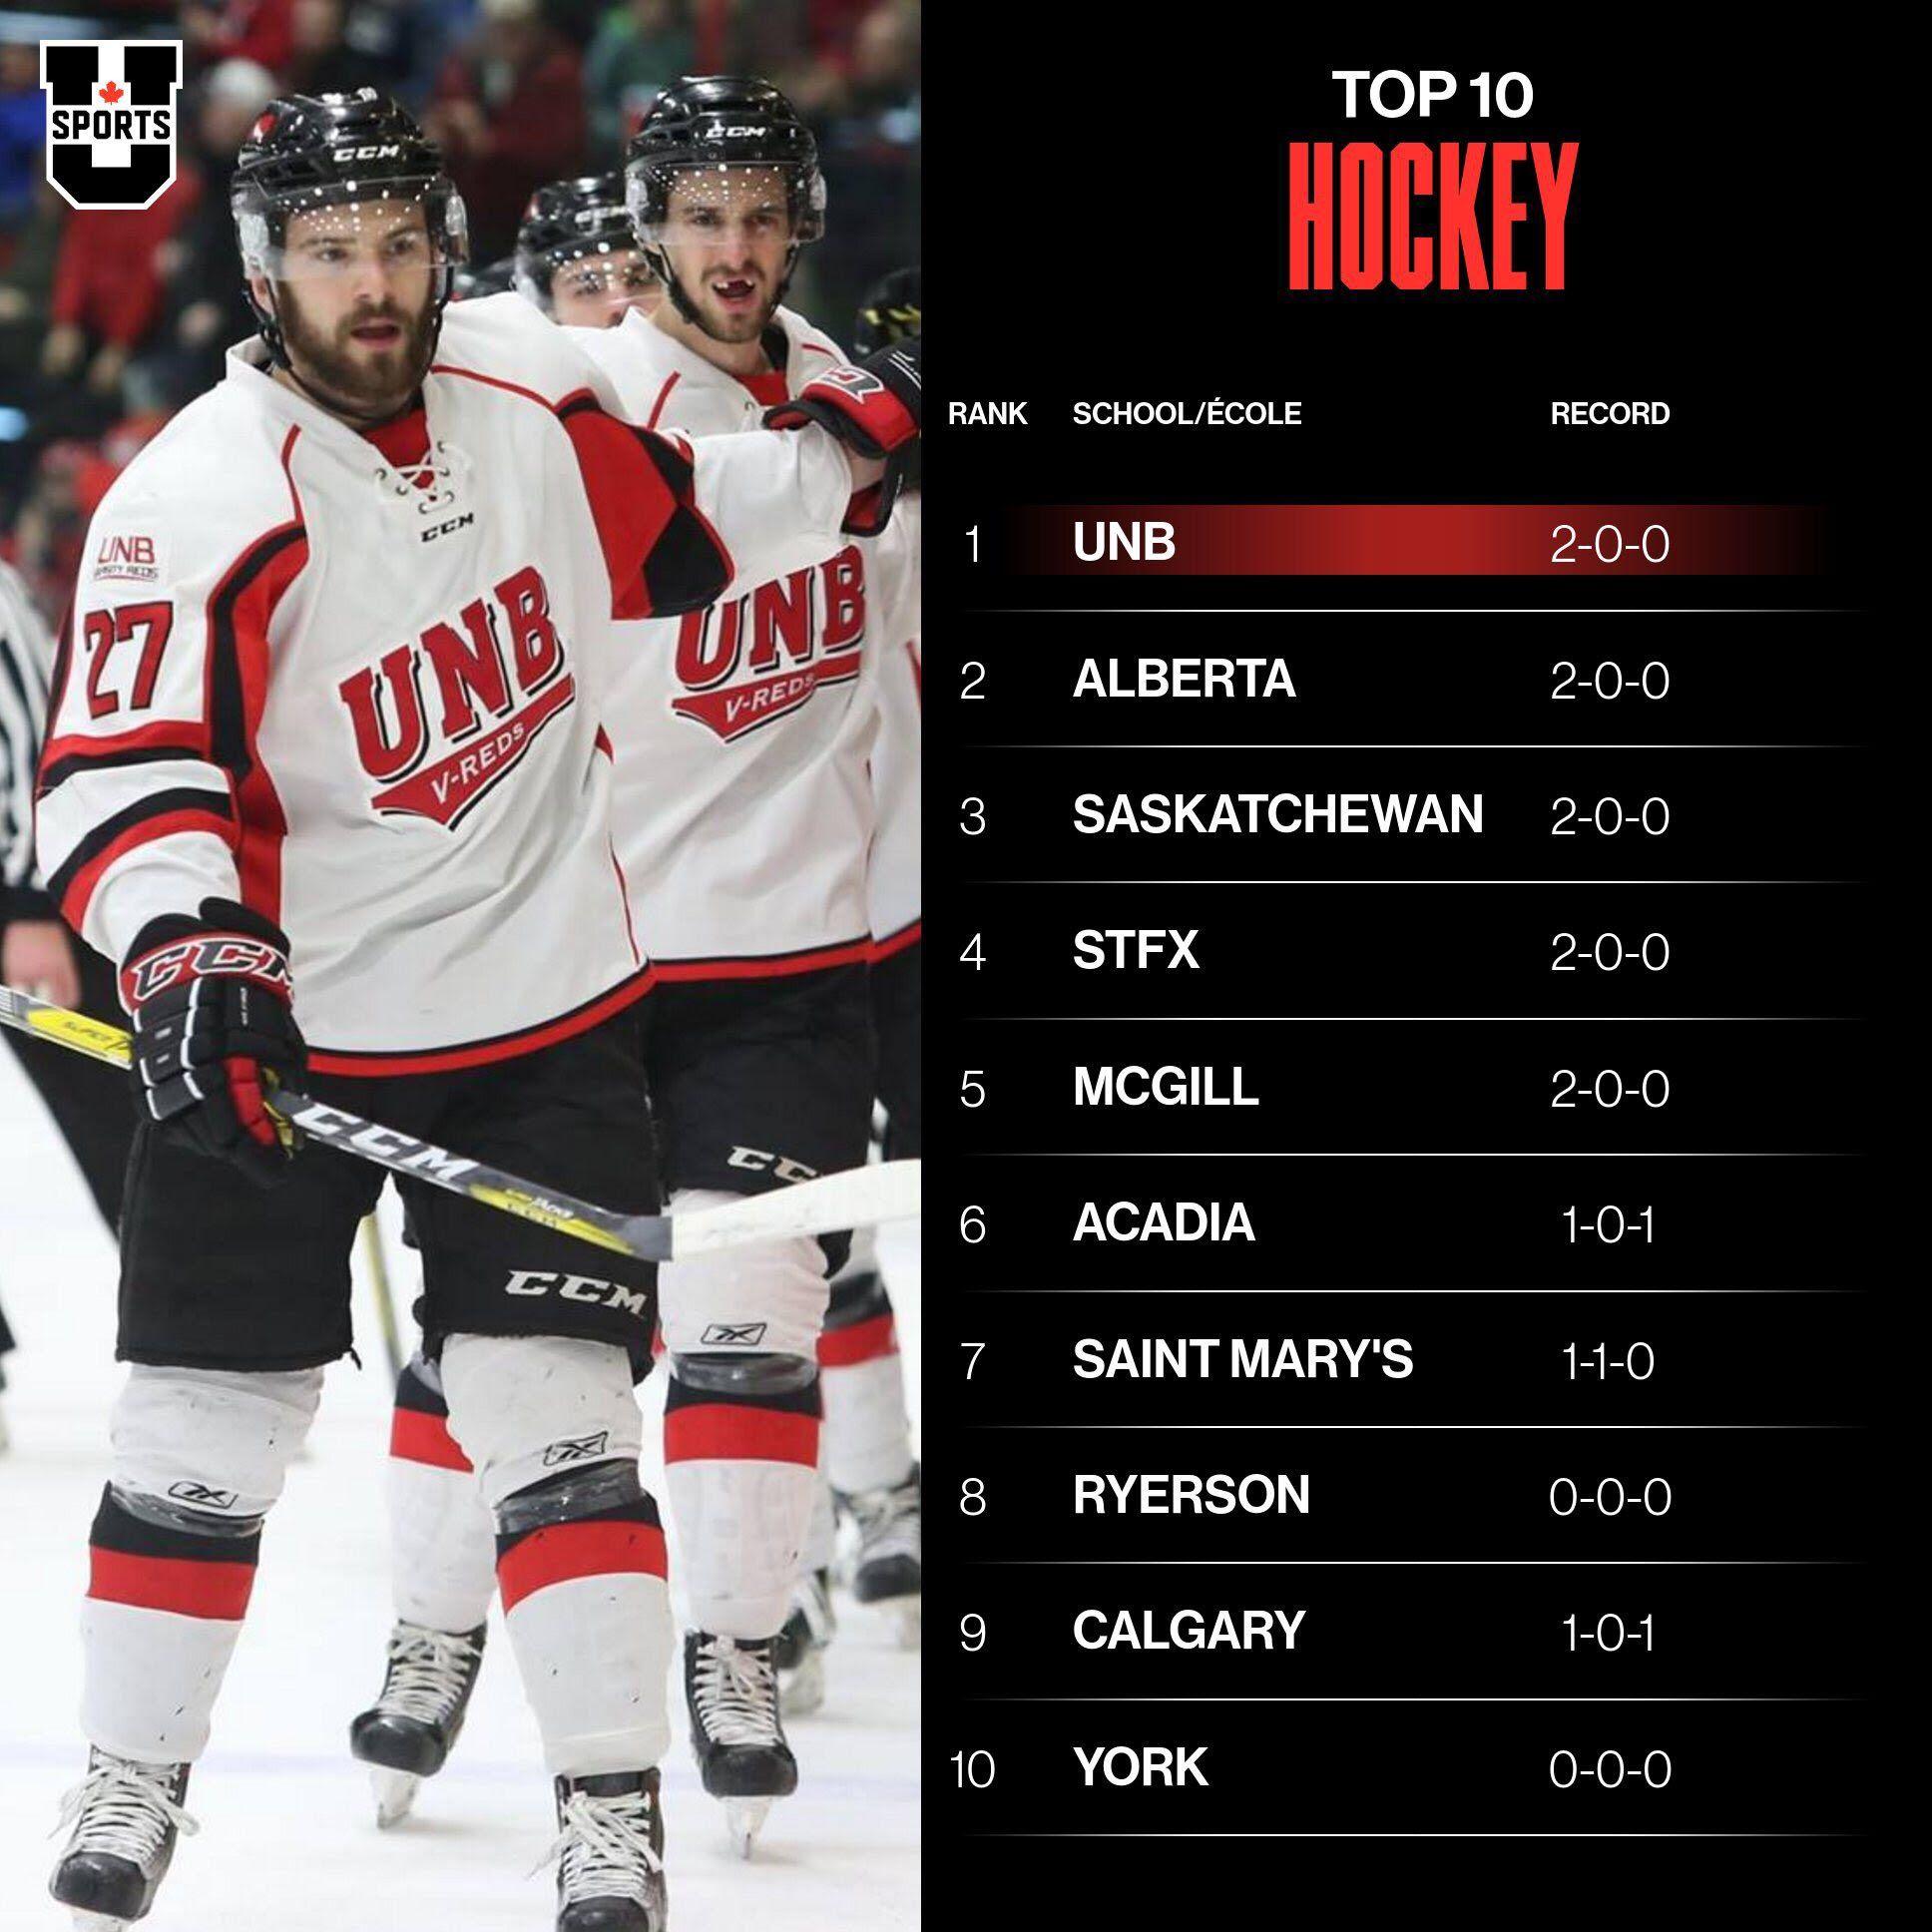 Panda-monium: Alberta claims top women's hockey ranking for first time since 2007